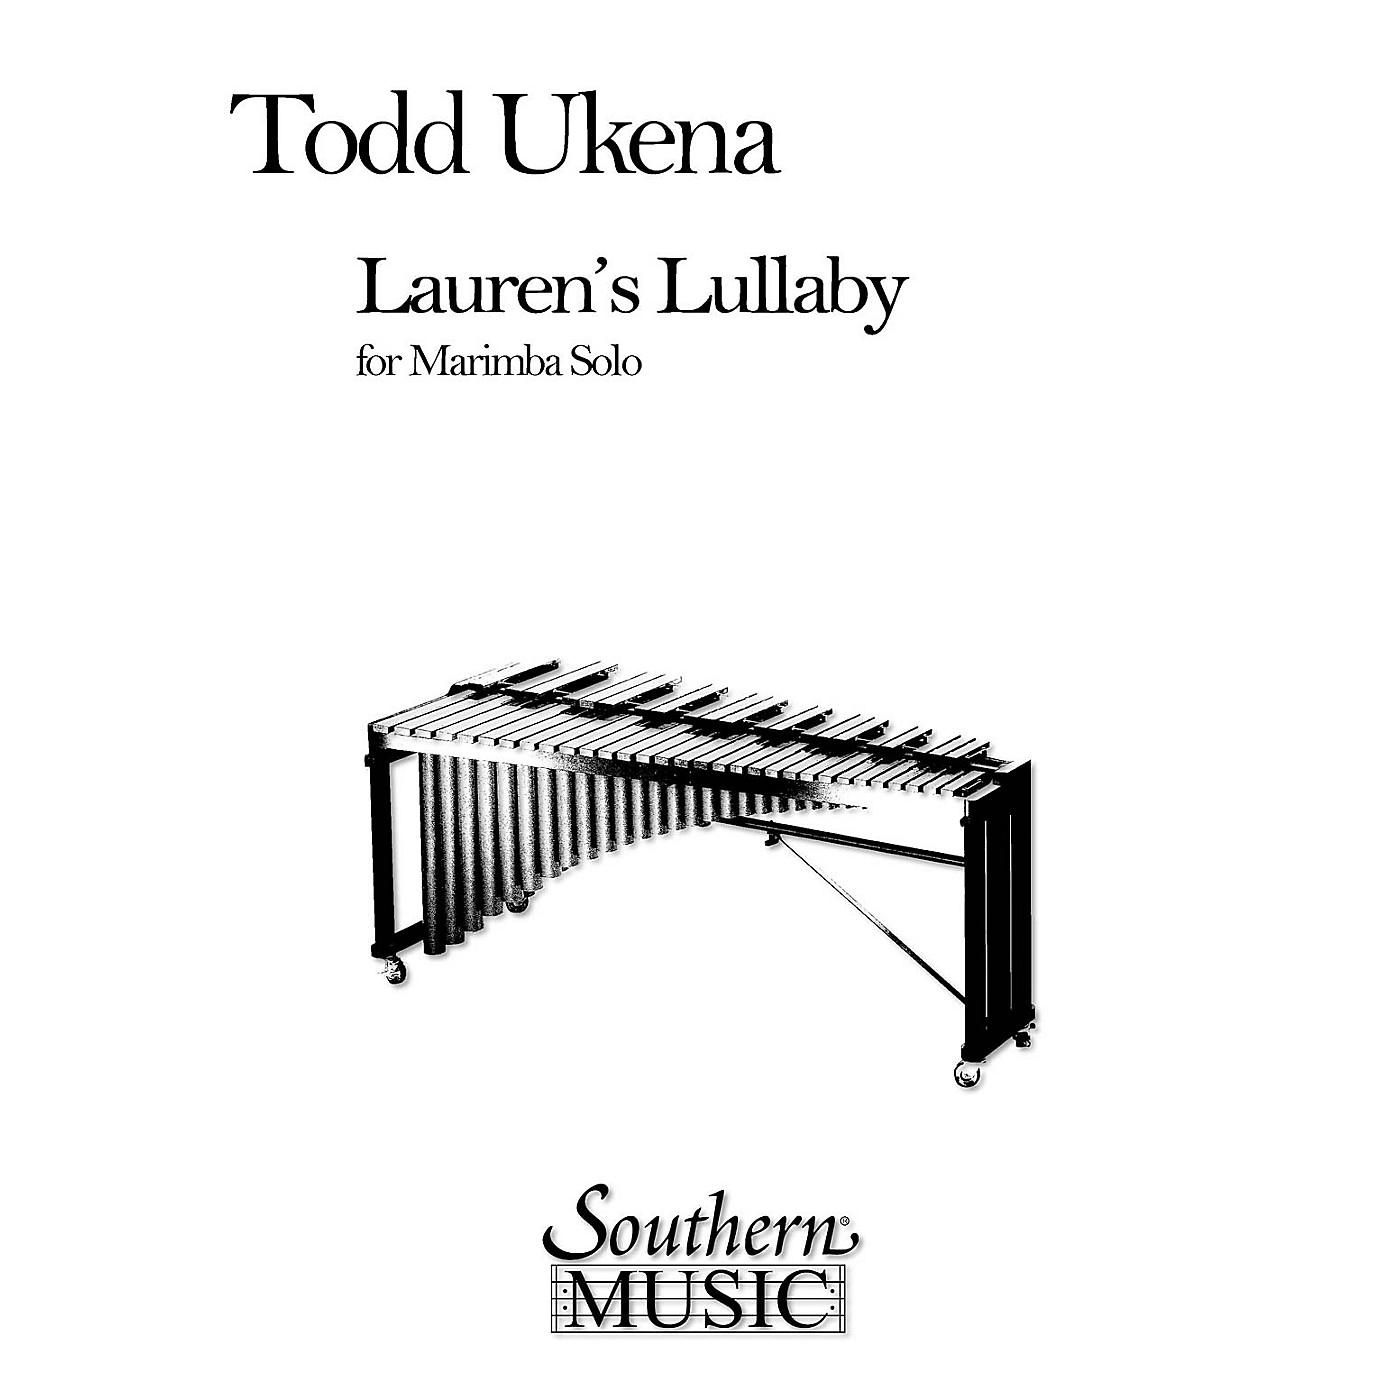 Hal Leonard Lauren's Lullaby (Percussion Music/Mallet/marimba/vibra) Southern Music Series Composed by Ukena, Todd thumbnail